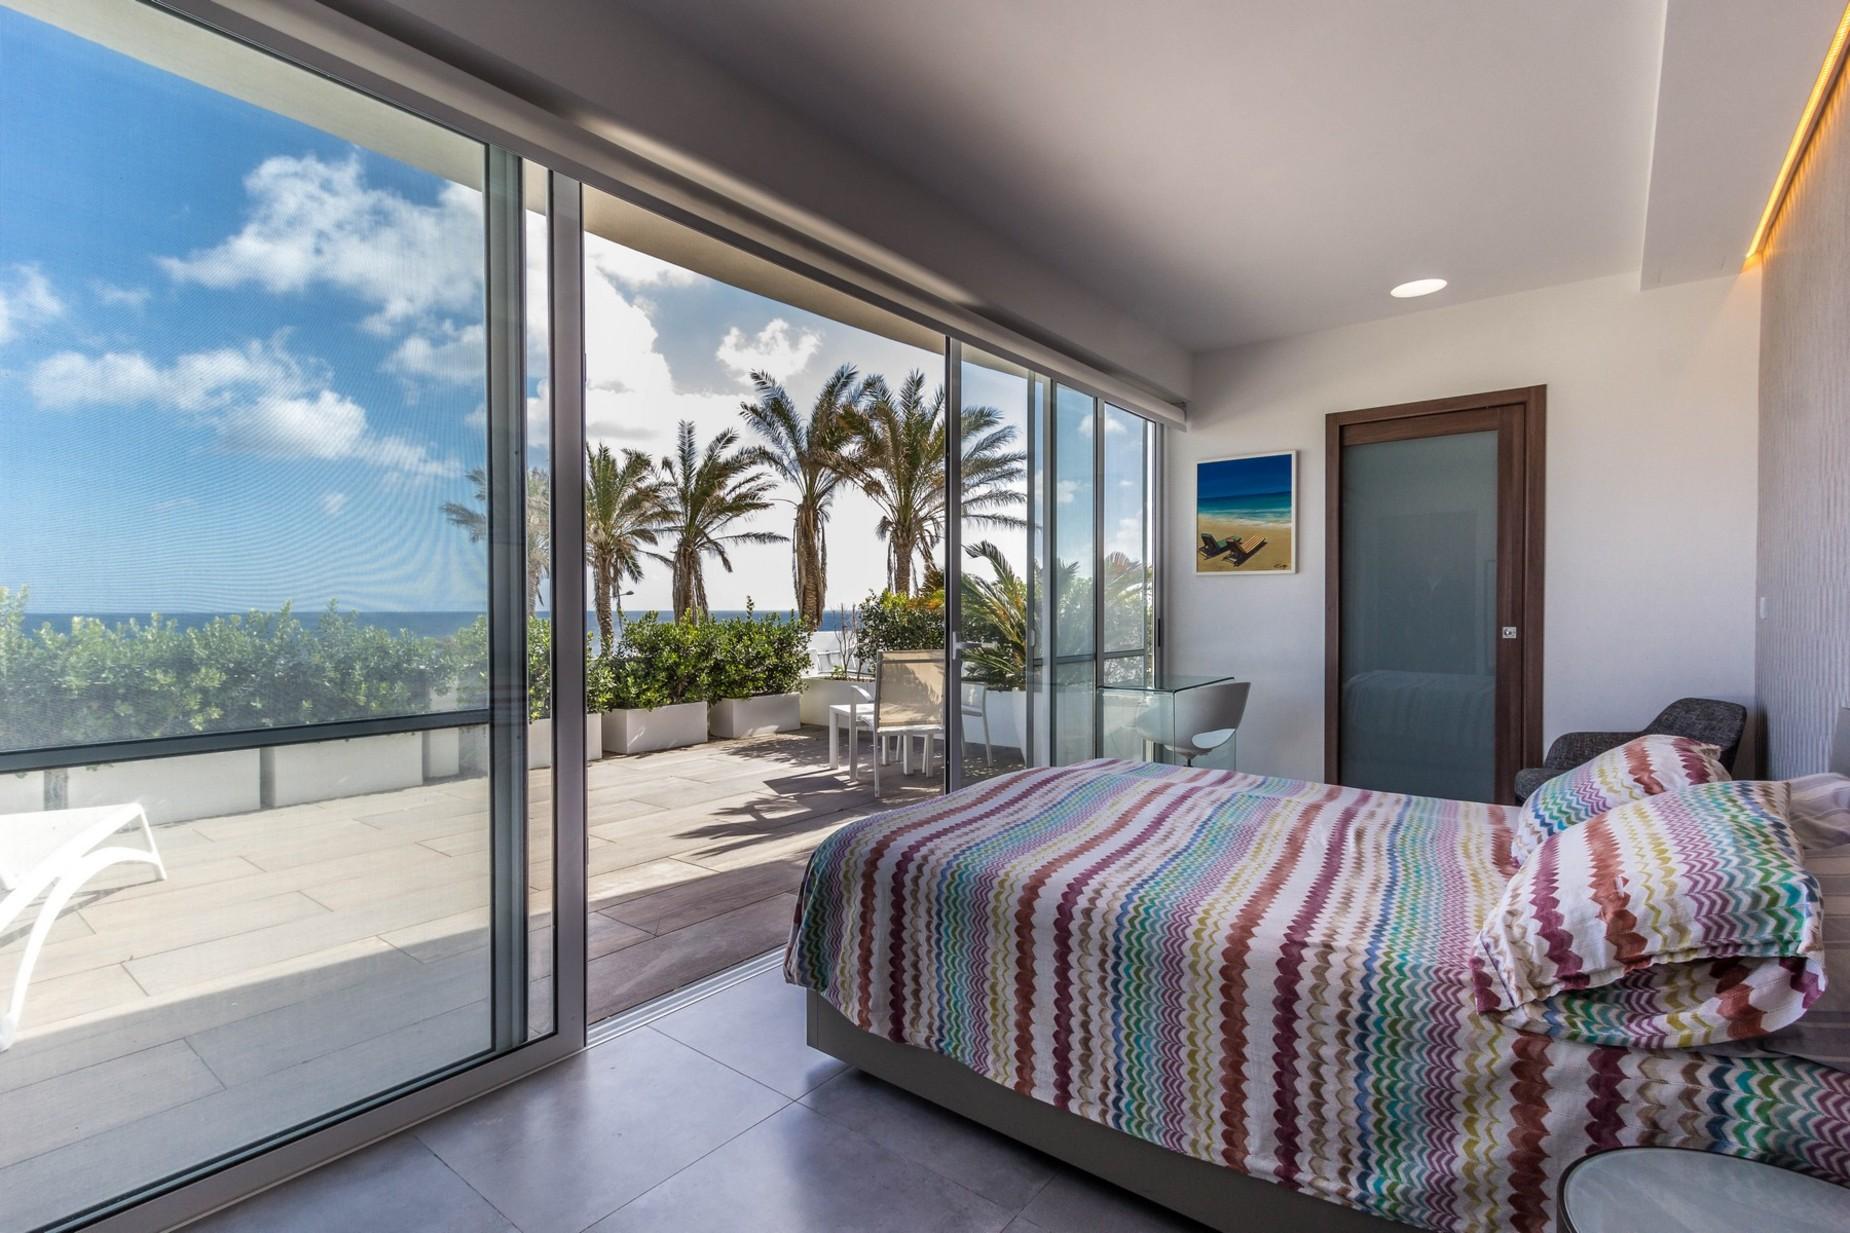 4 bed Villa For Sale in Marsascala, Marsascala - thumb 11